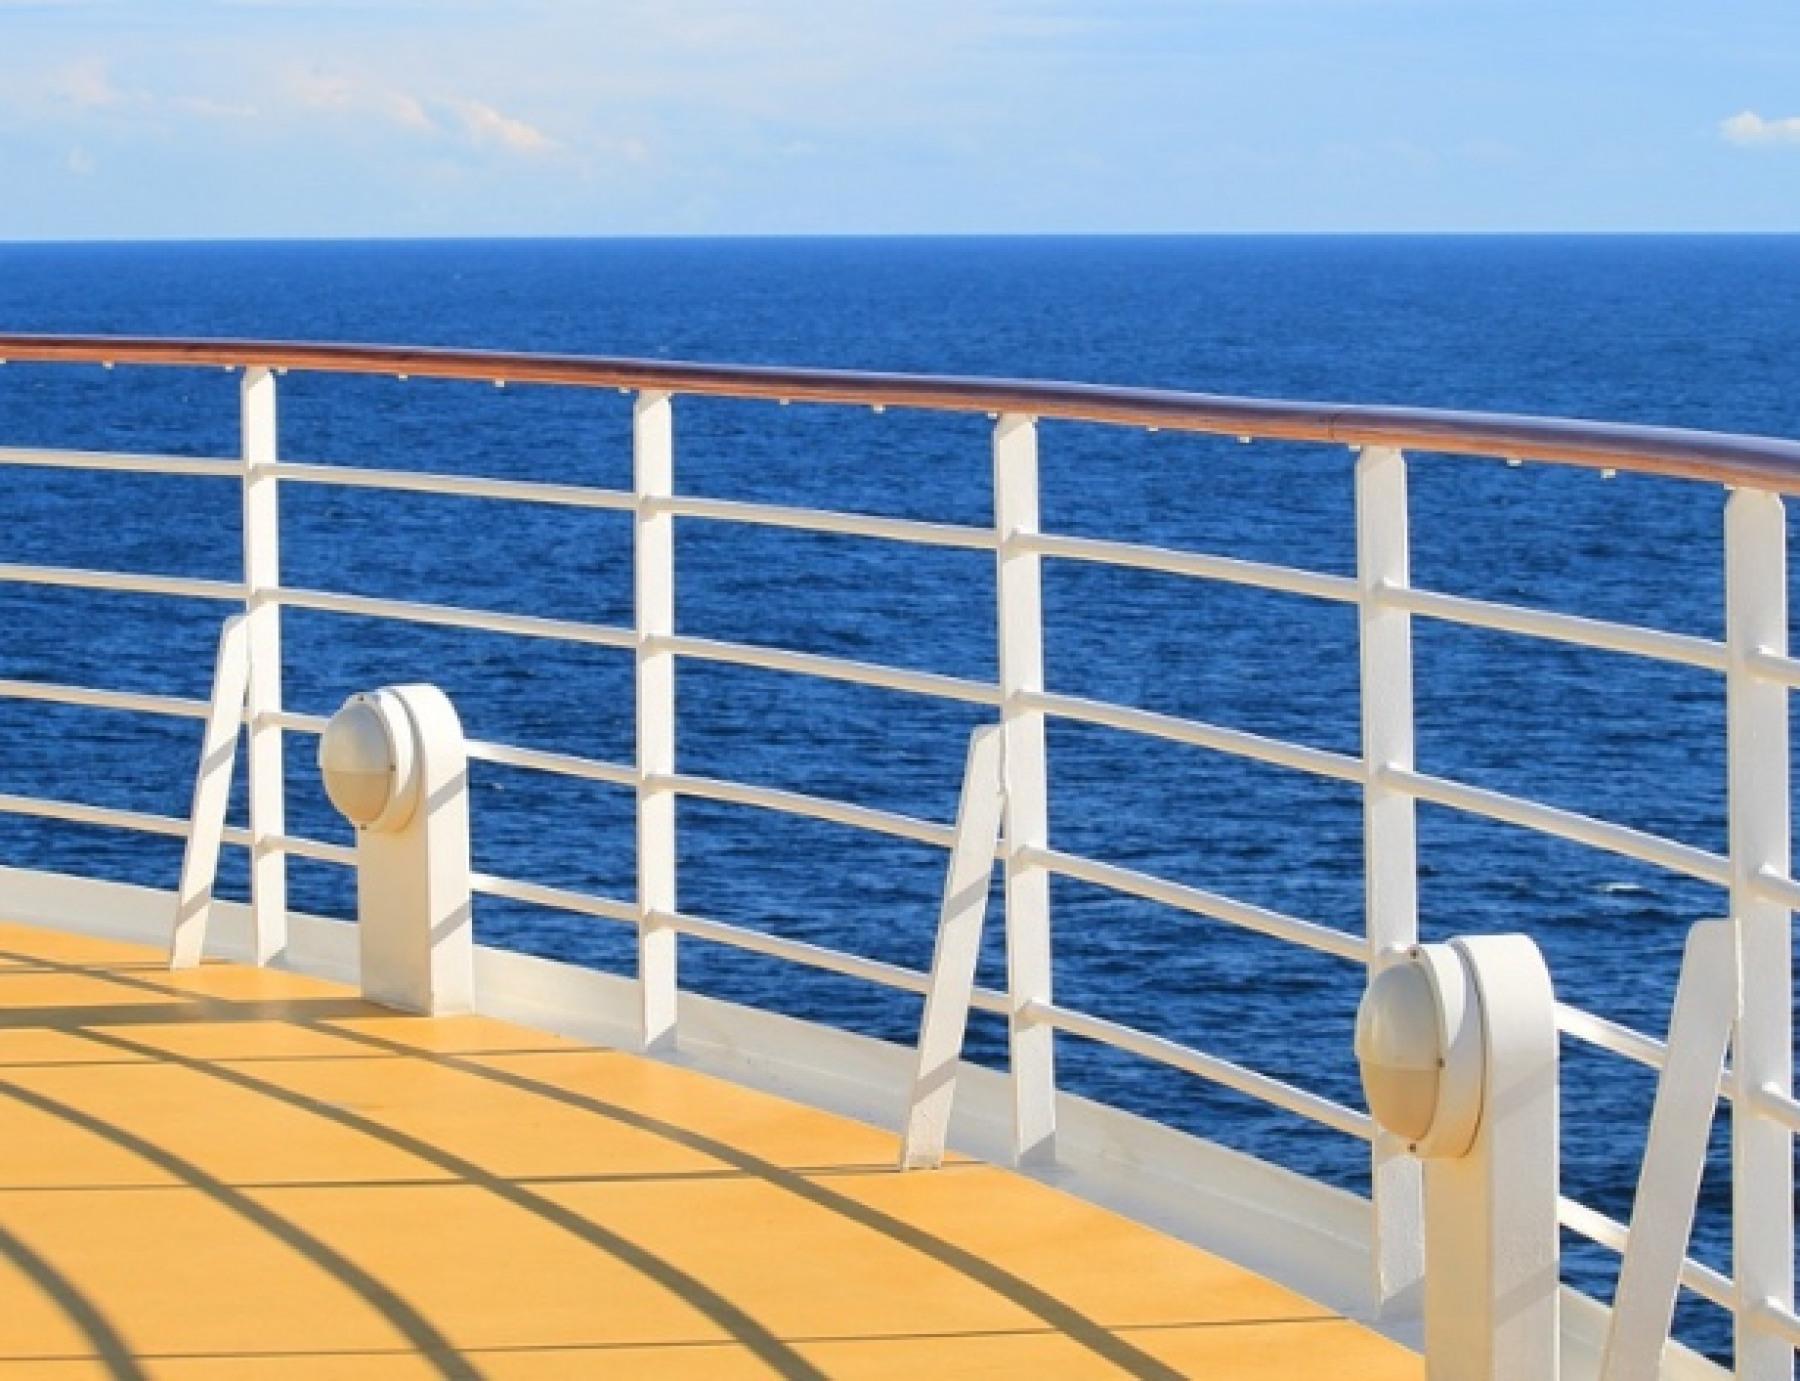 Norwegian Cruise Line Norwegian Dawn Interior The Pearly Kings Pub.jpg